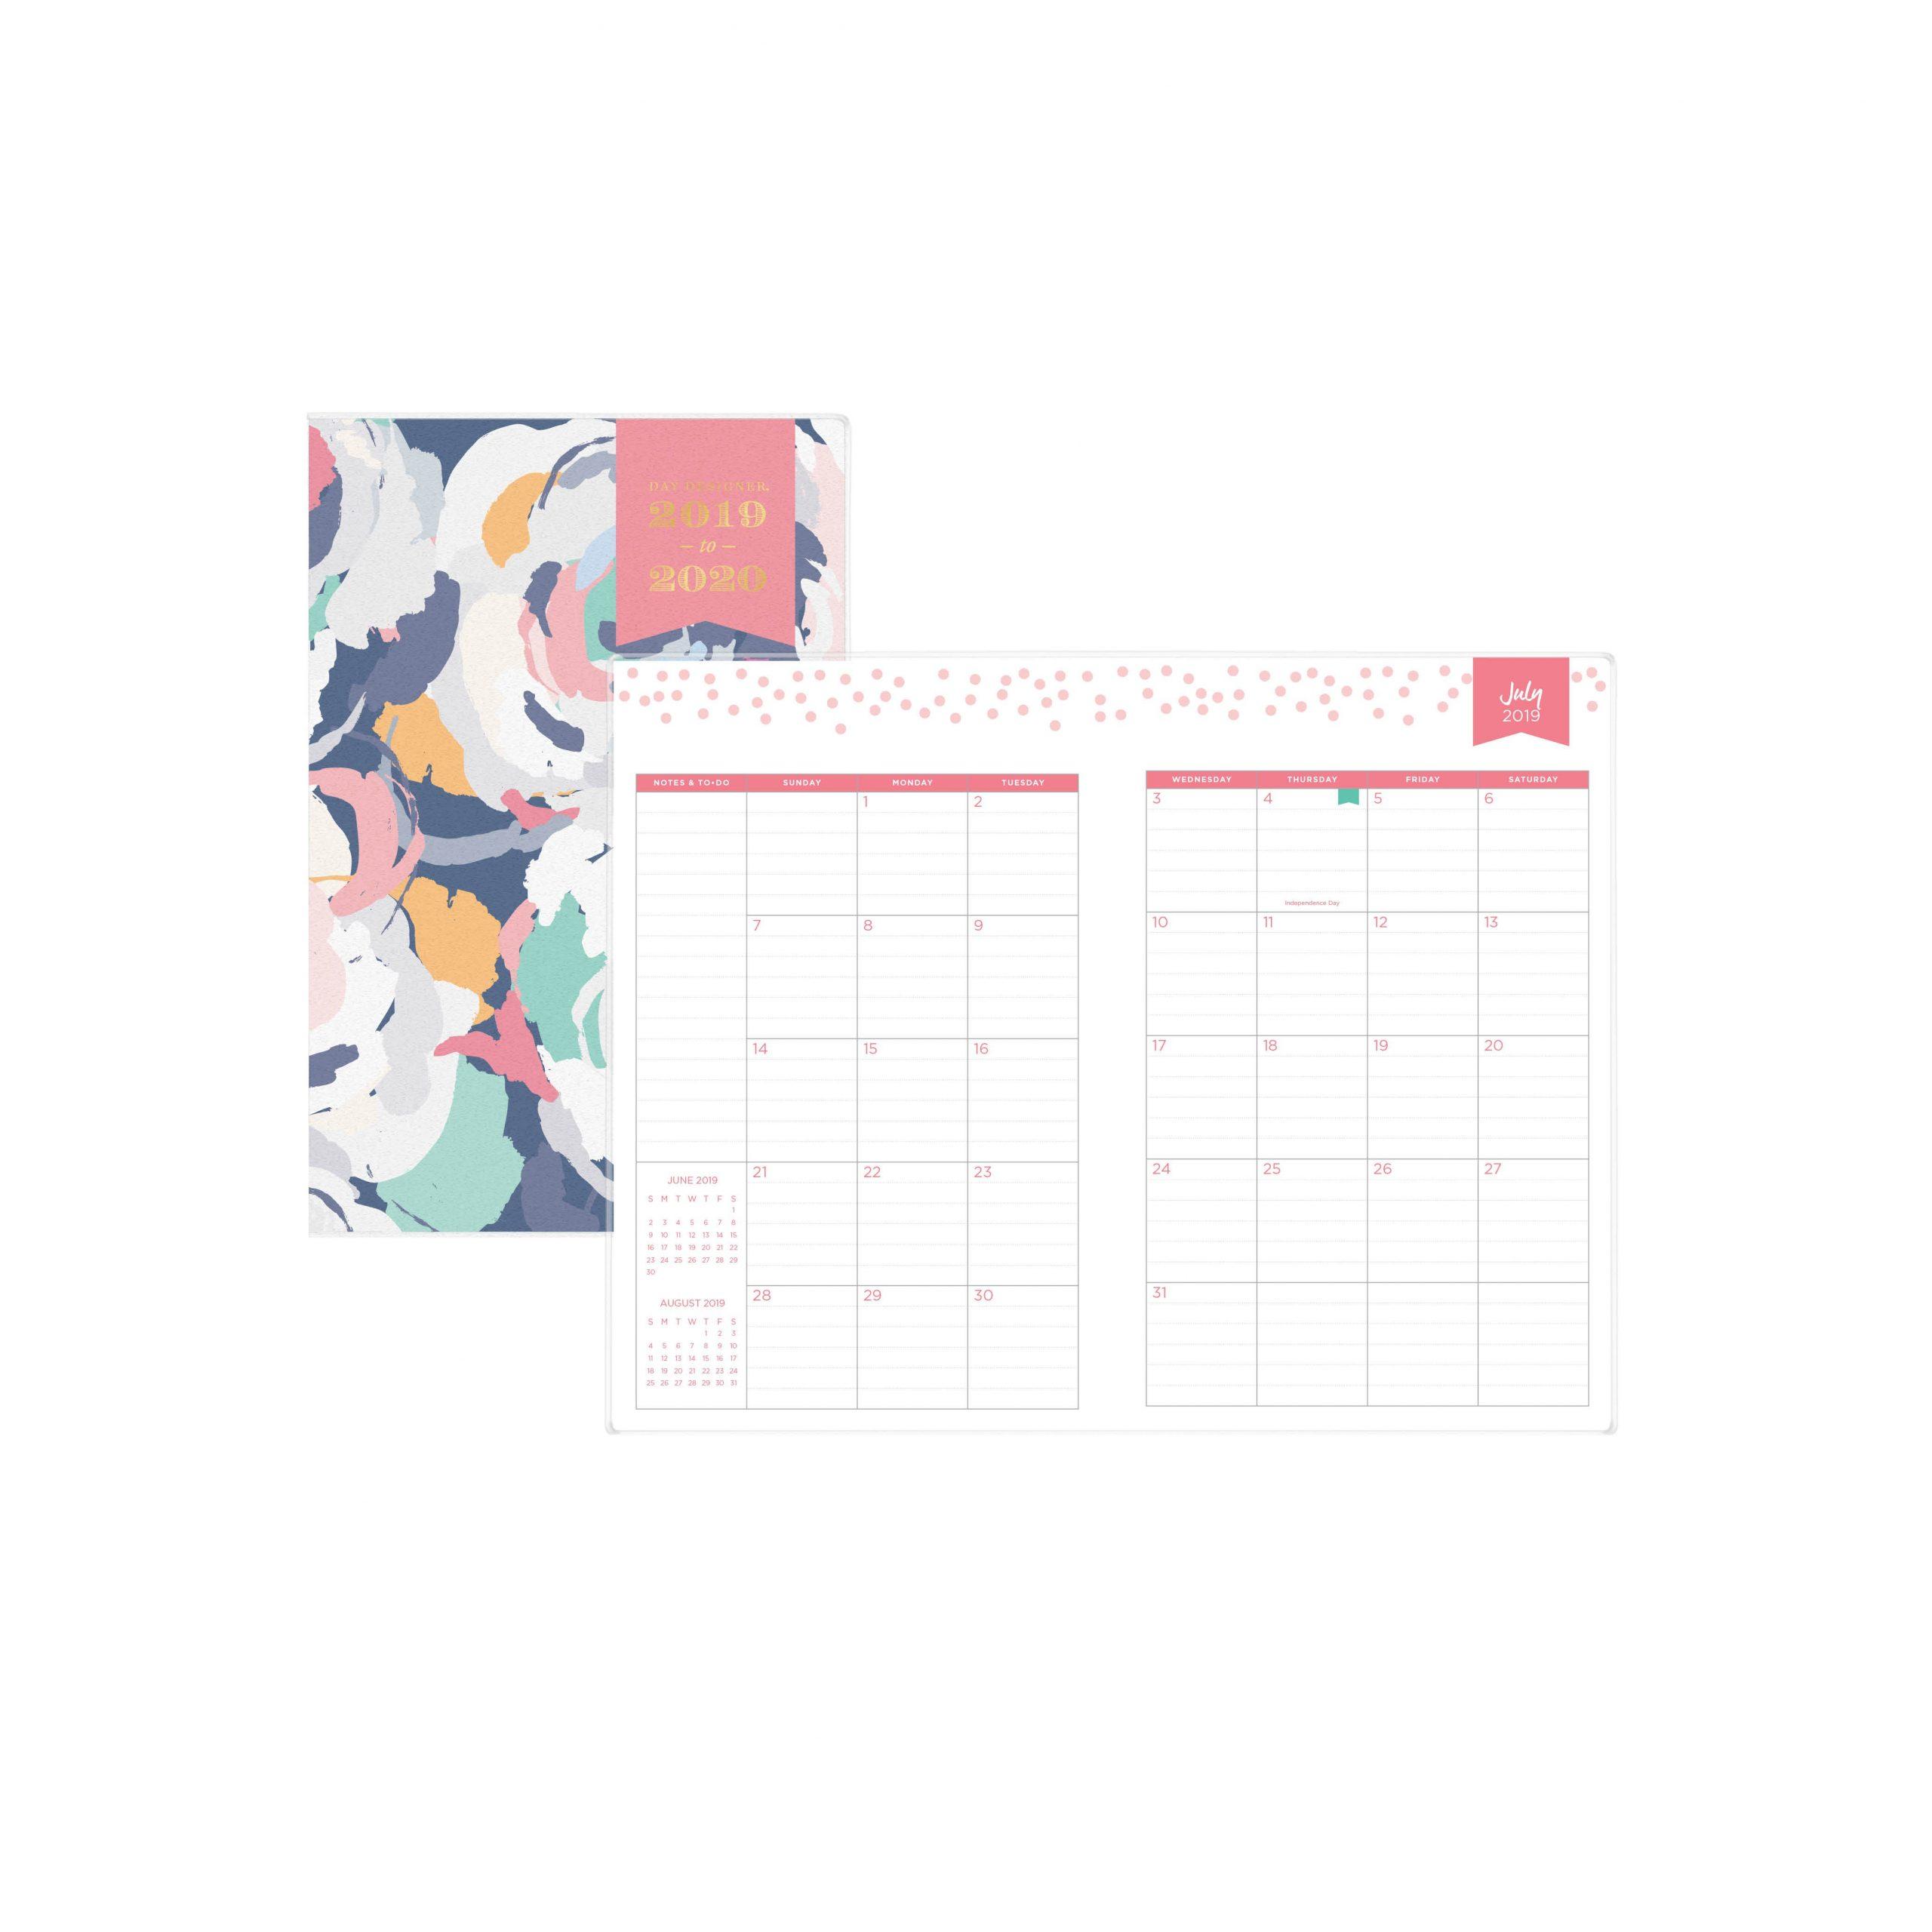 2020 Calendar For 5.5 X 8.5 | Calendar Template Printable 8.5 X 5.5 Calendar